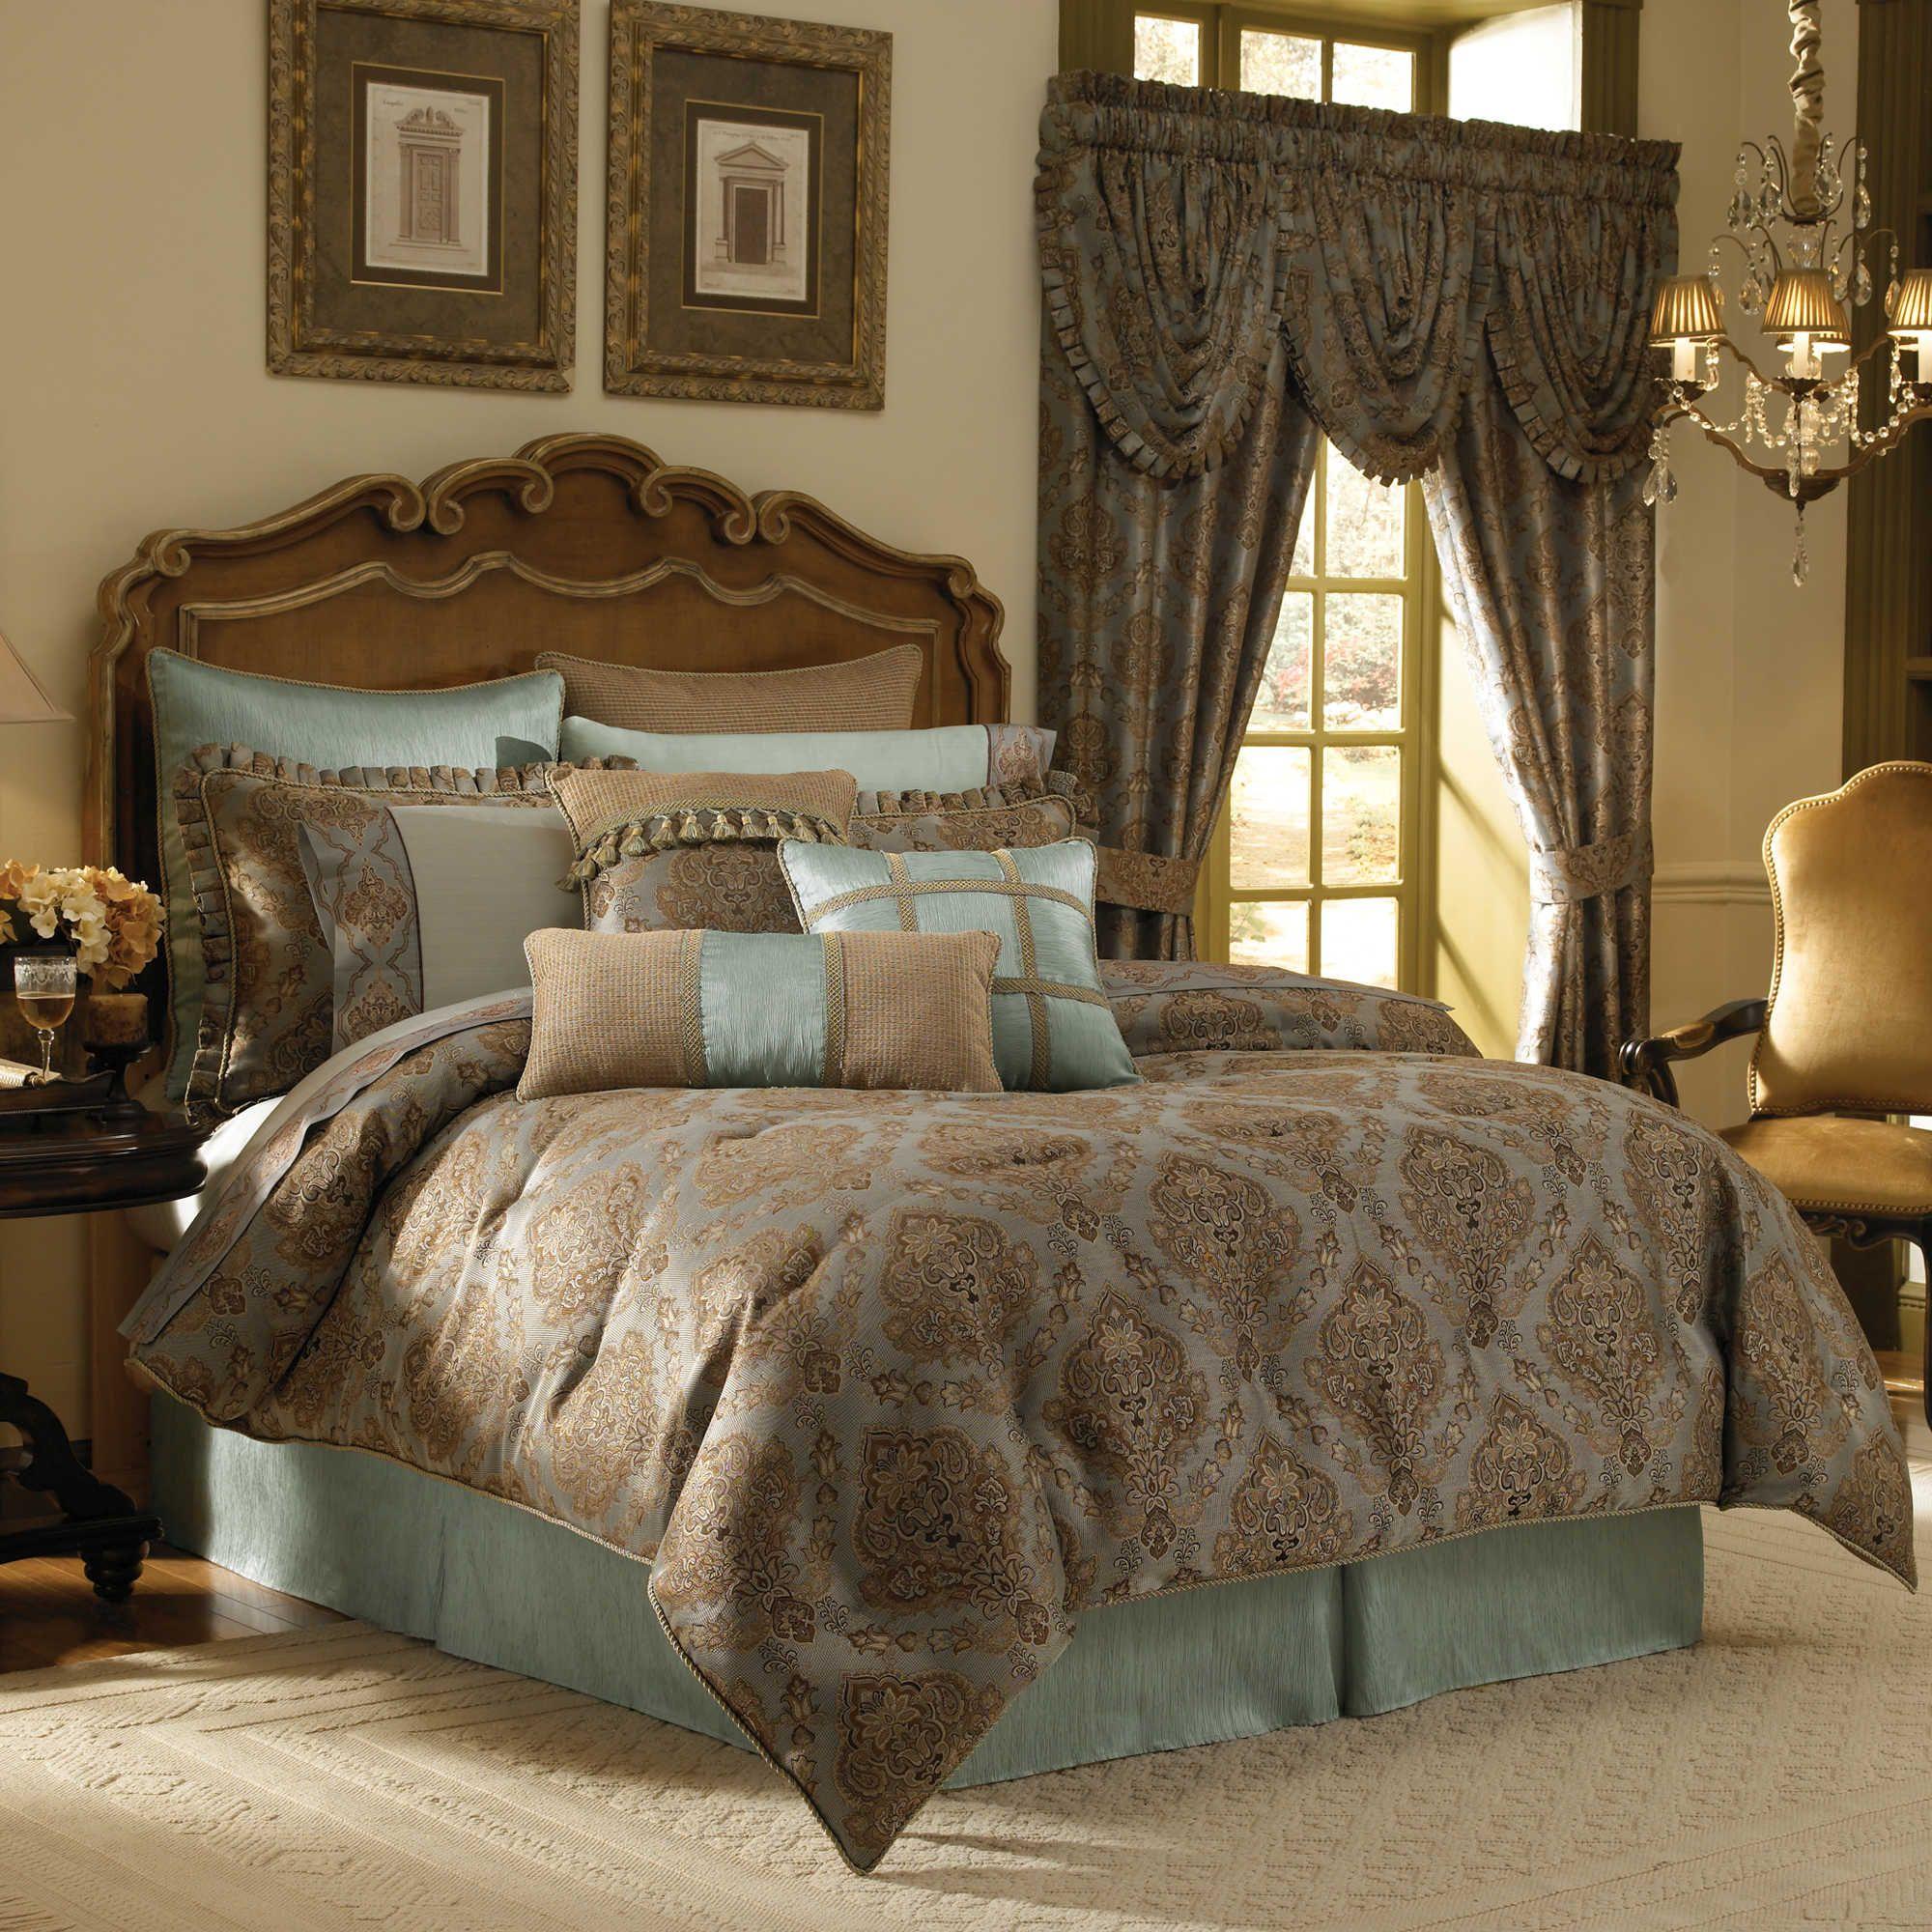 Croscill Laviano Comforter Set | Comforter sets, Home ...